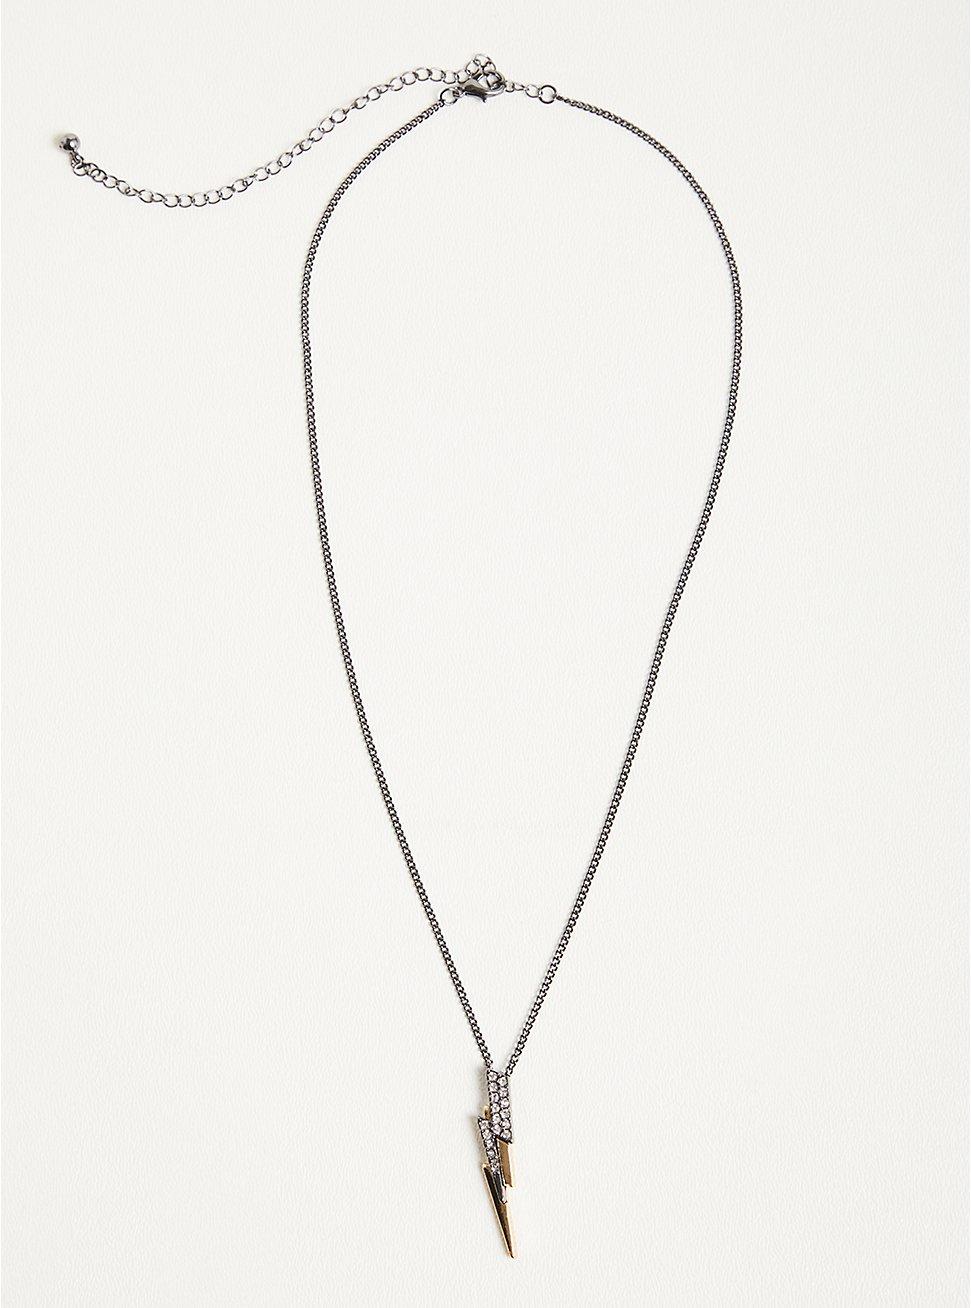 Plus Size Delicate Lightning Bolt Necklace - Gold & Hematite Tone, , hi-res